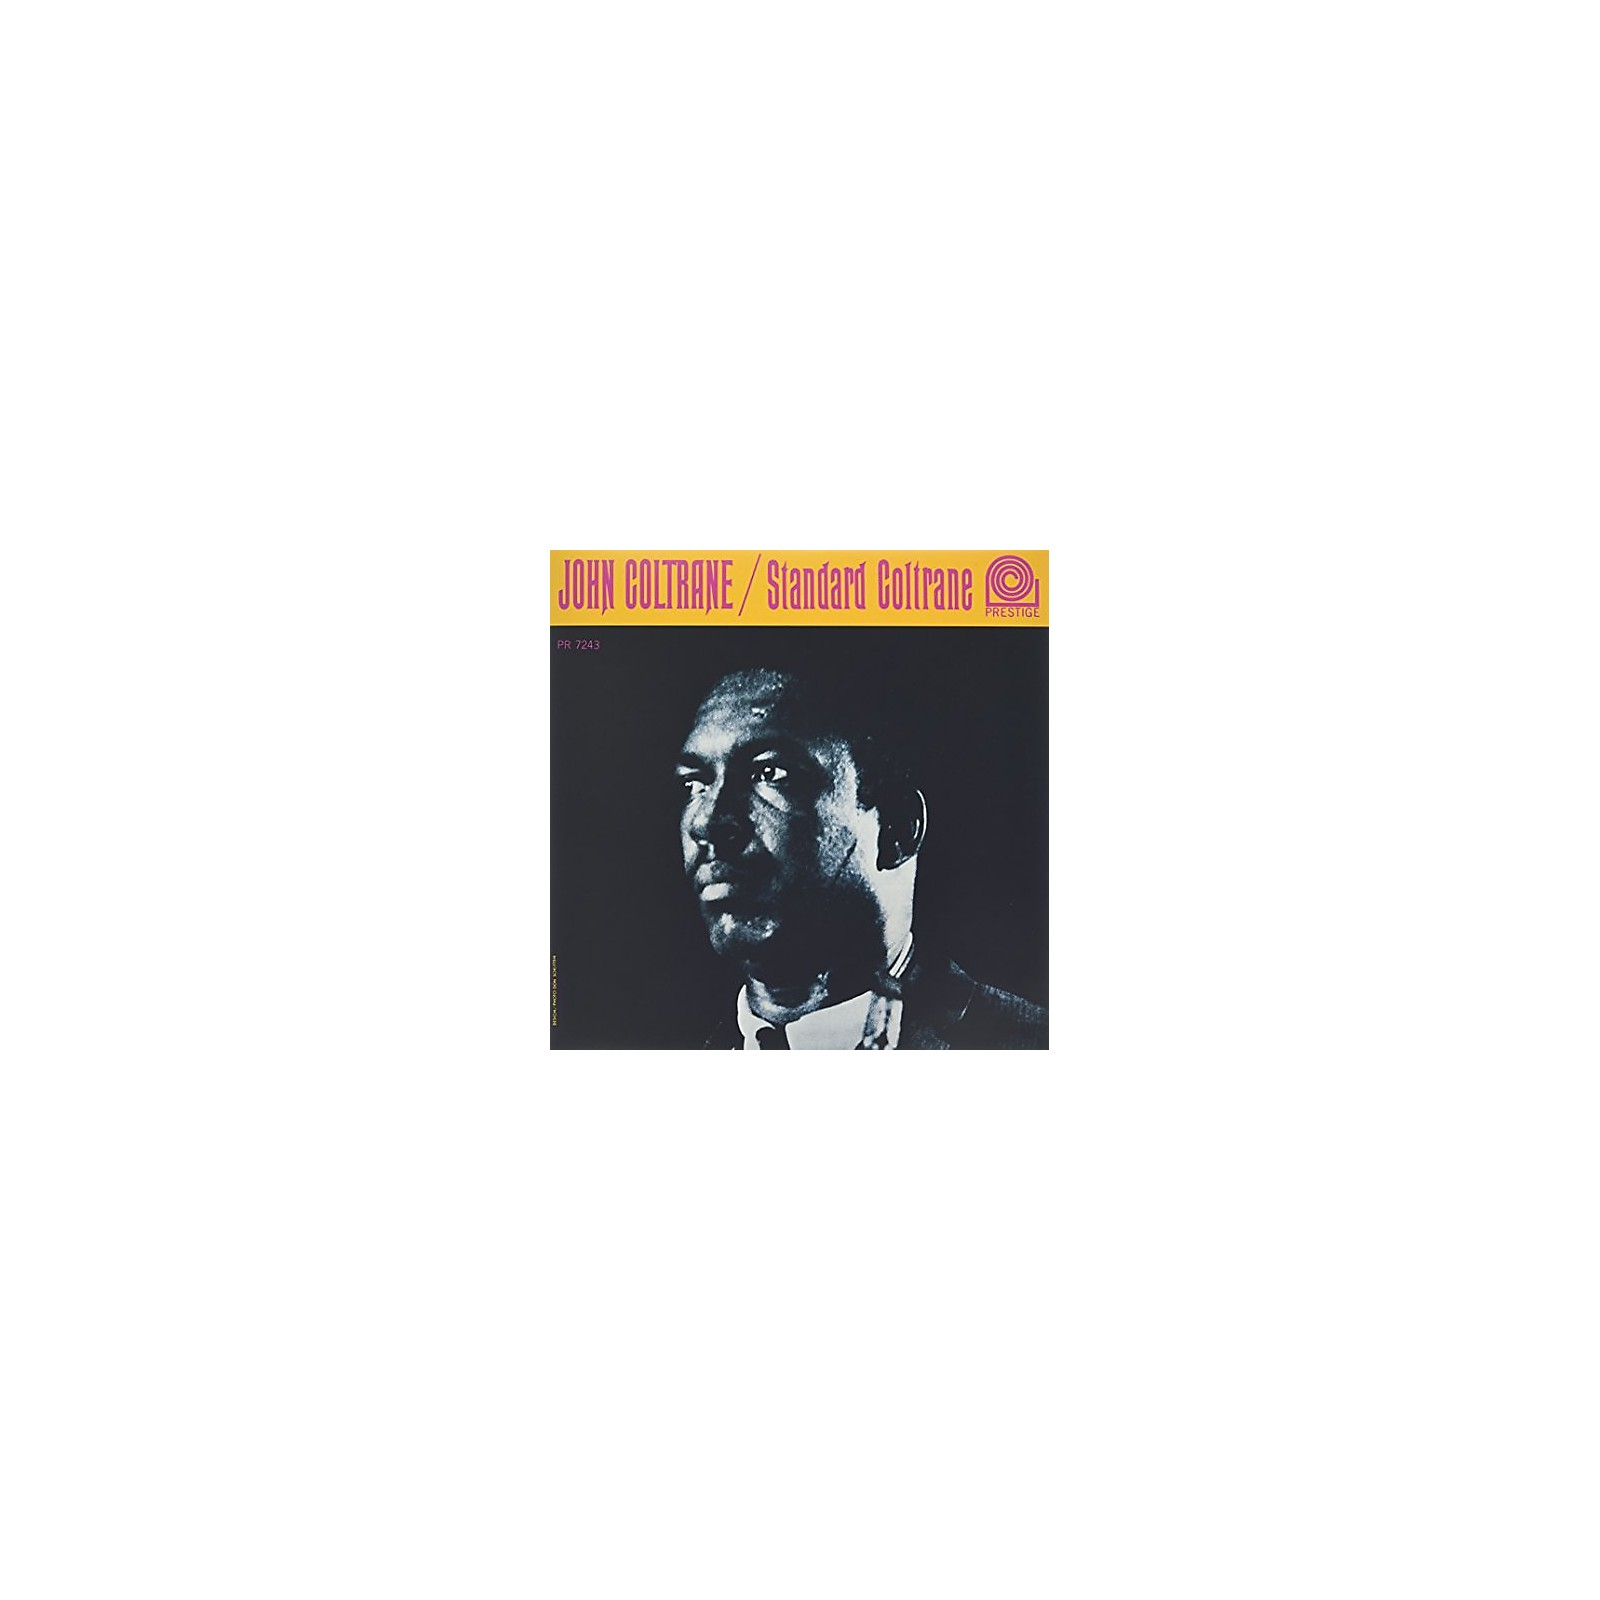 Alliance John Coltrane - Standard Coltrane